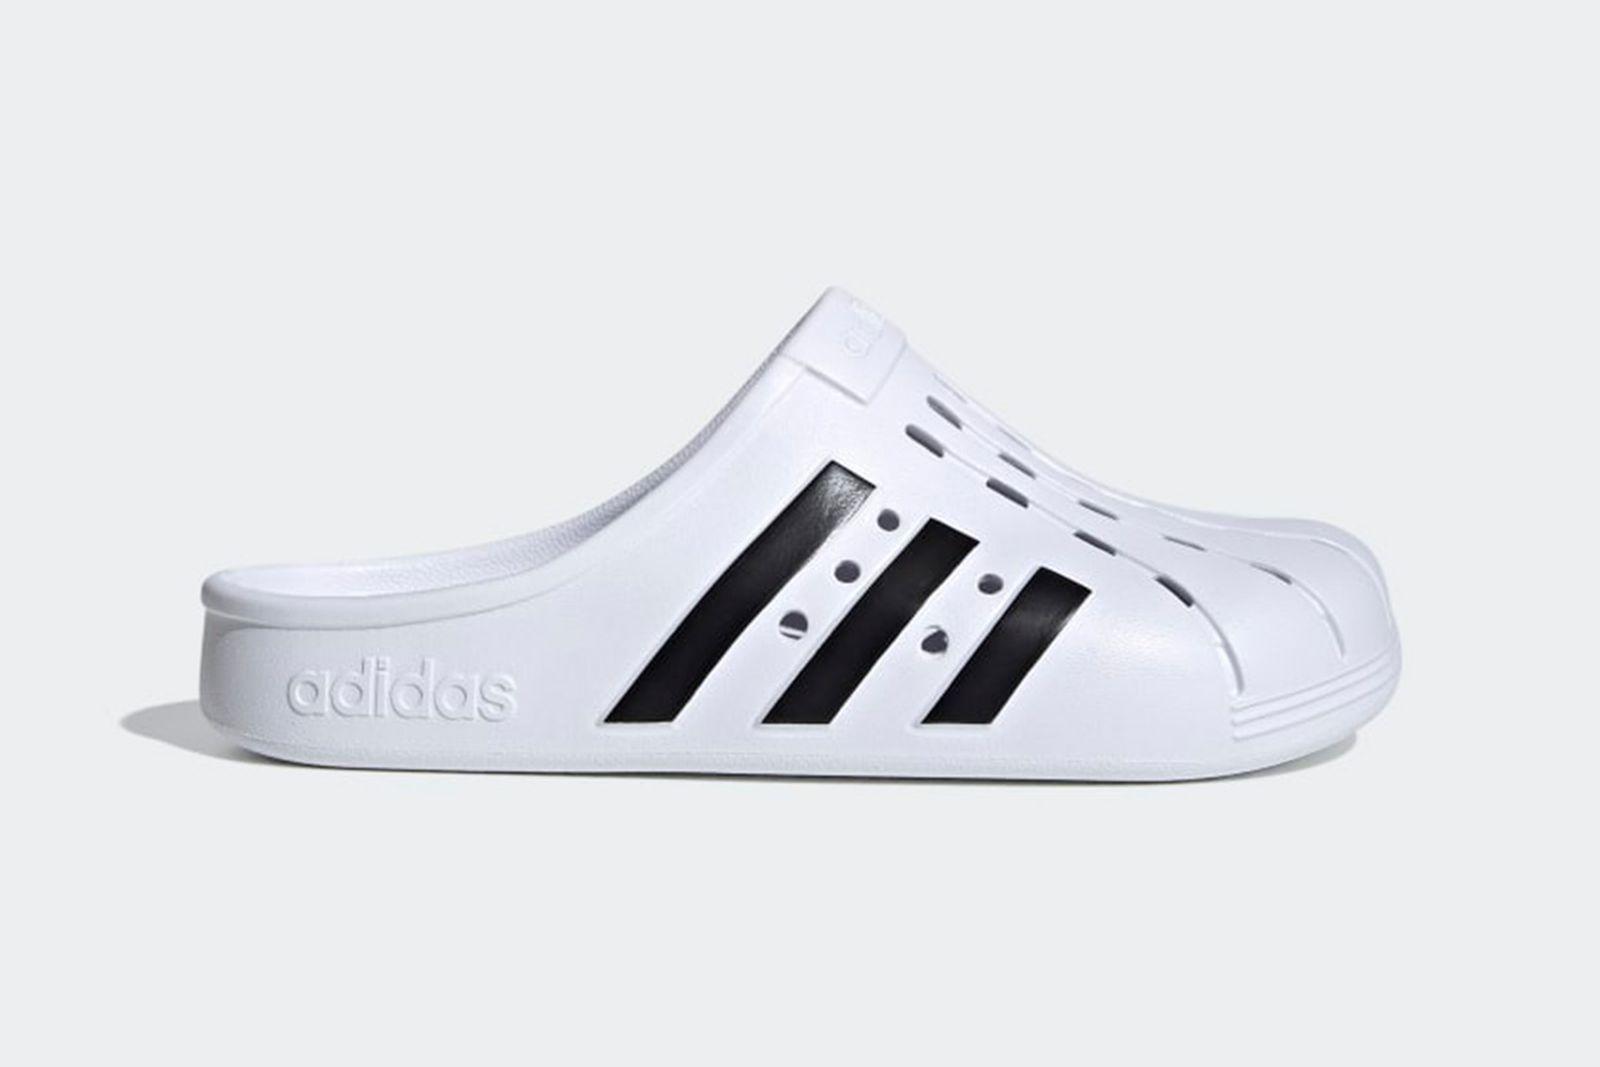 adidas-adilette-clog-release-date-price-05